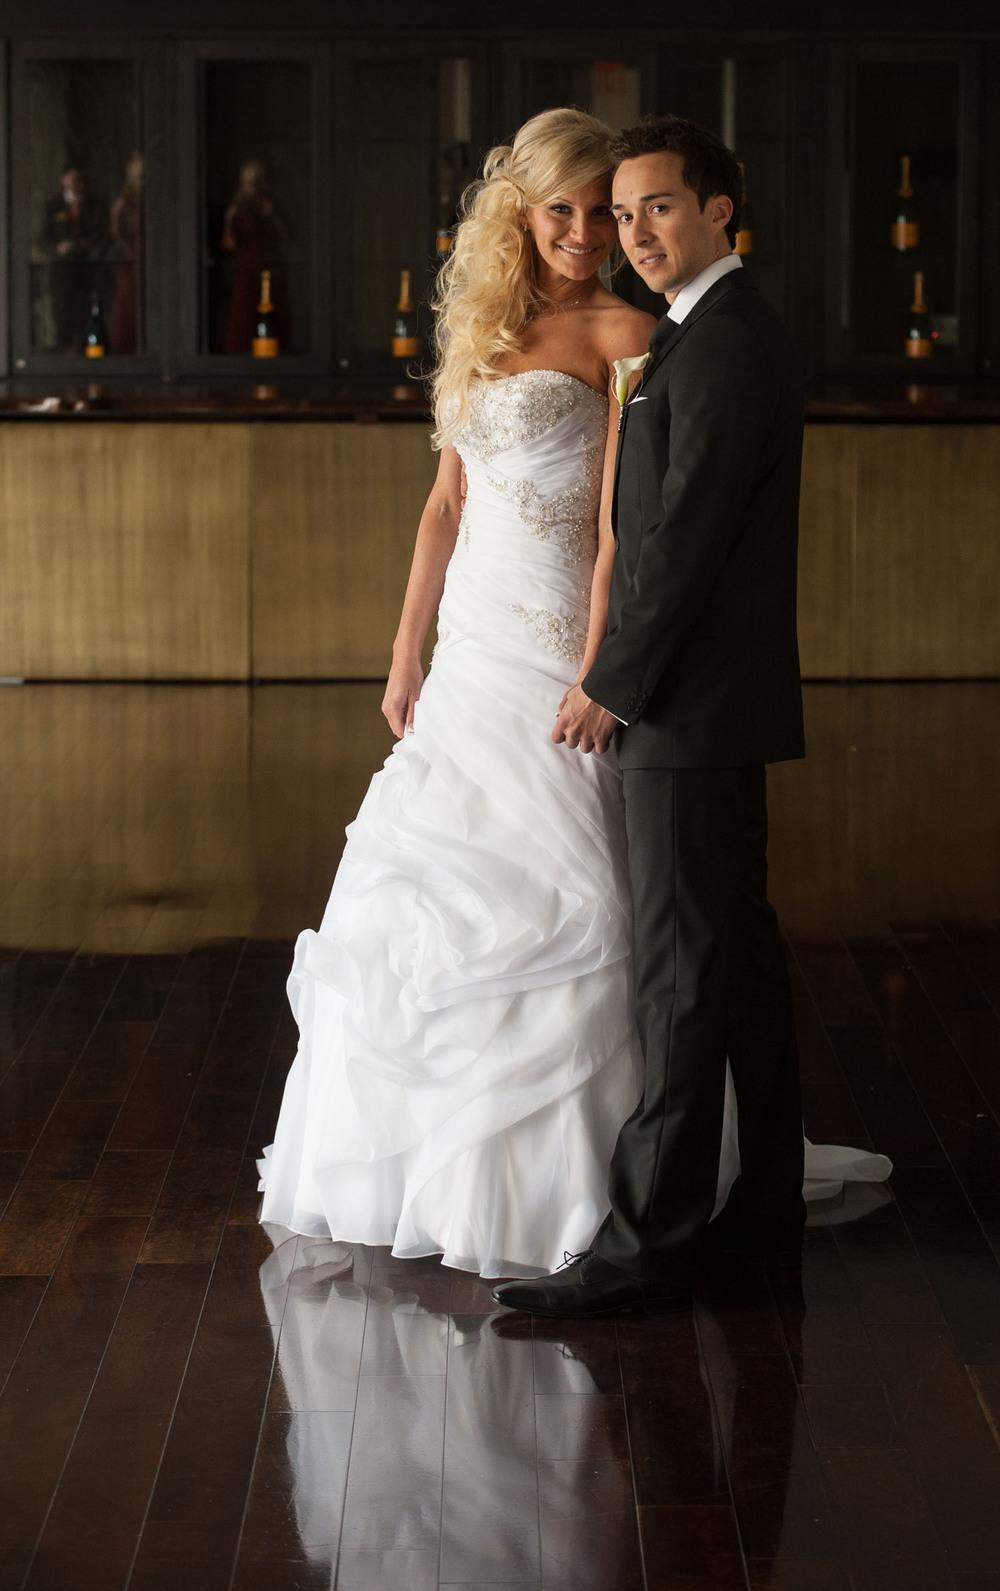 stewart_bertrand_wedding_photography_smblogwed-1002.jpg